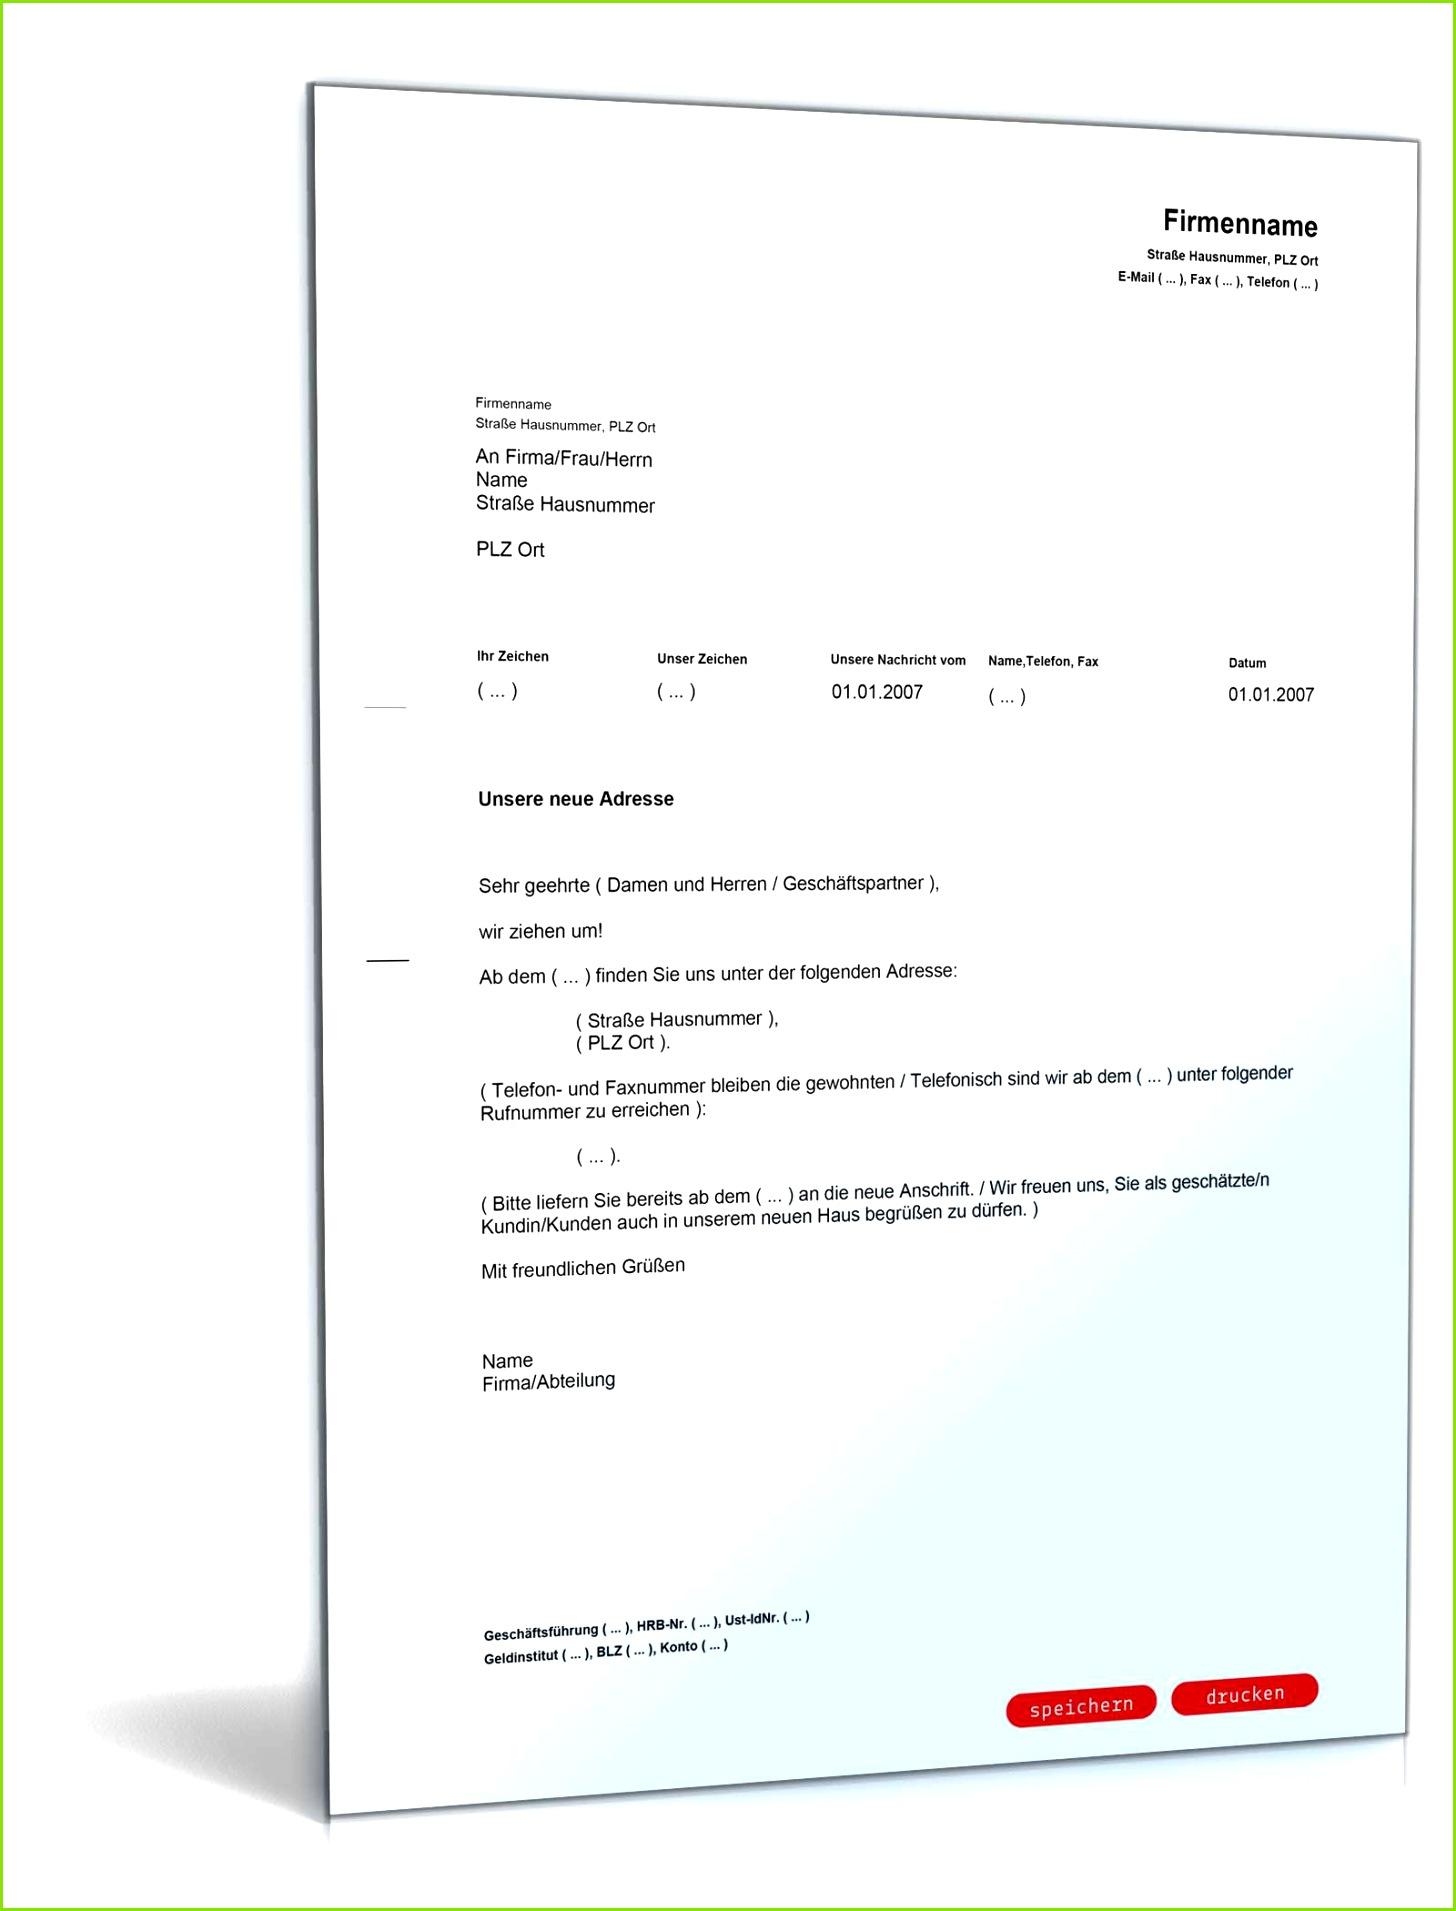 Muster als PDF & Doc GRATIS zum Download